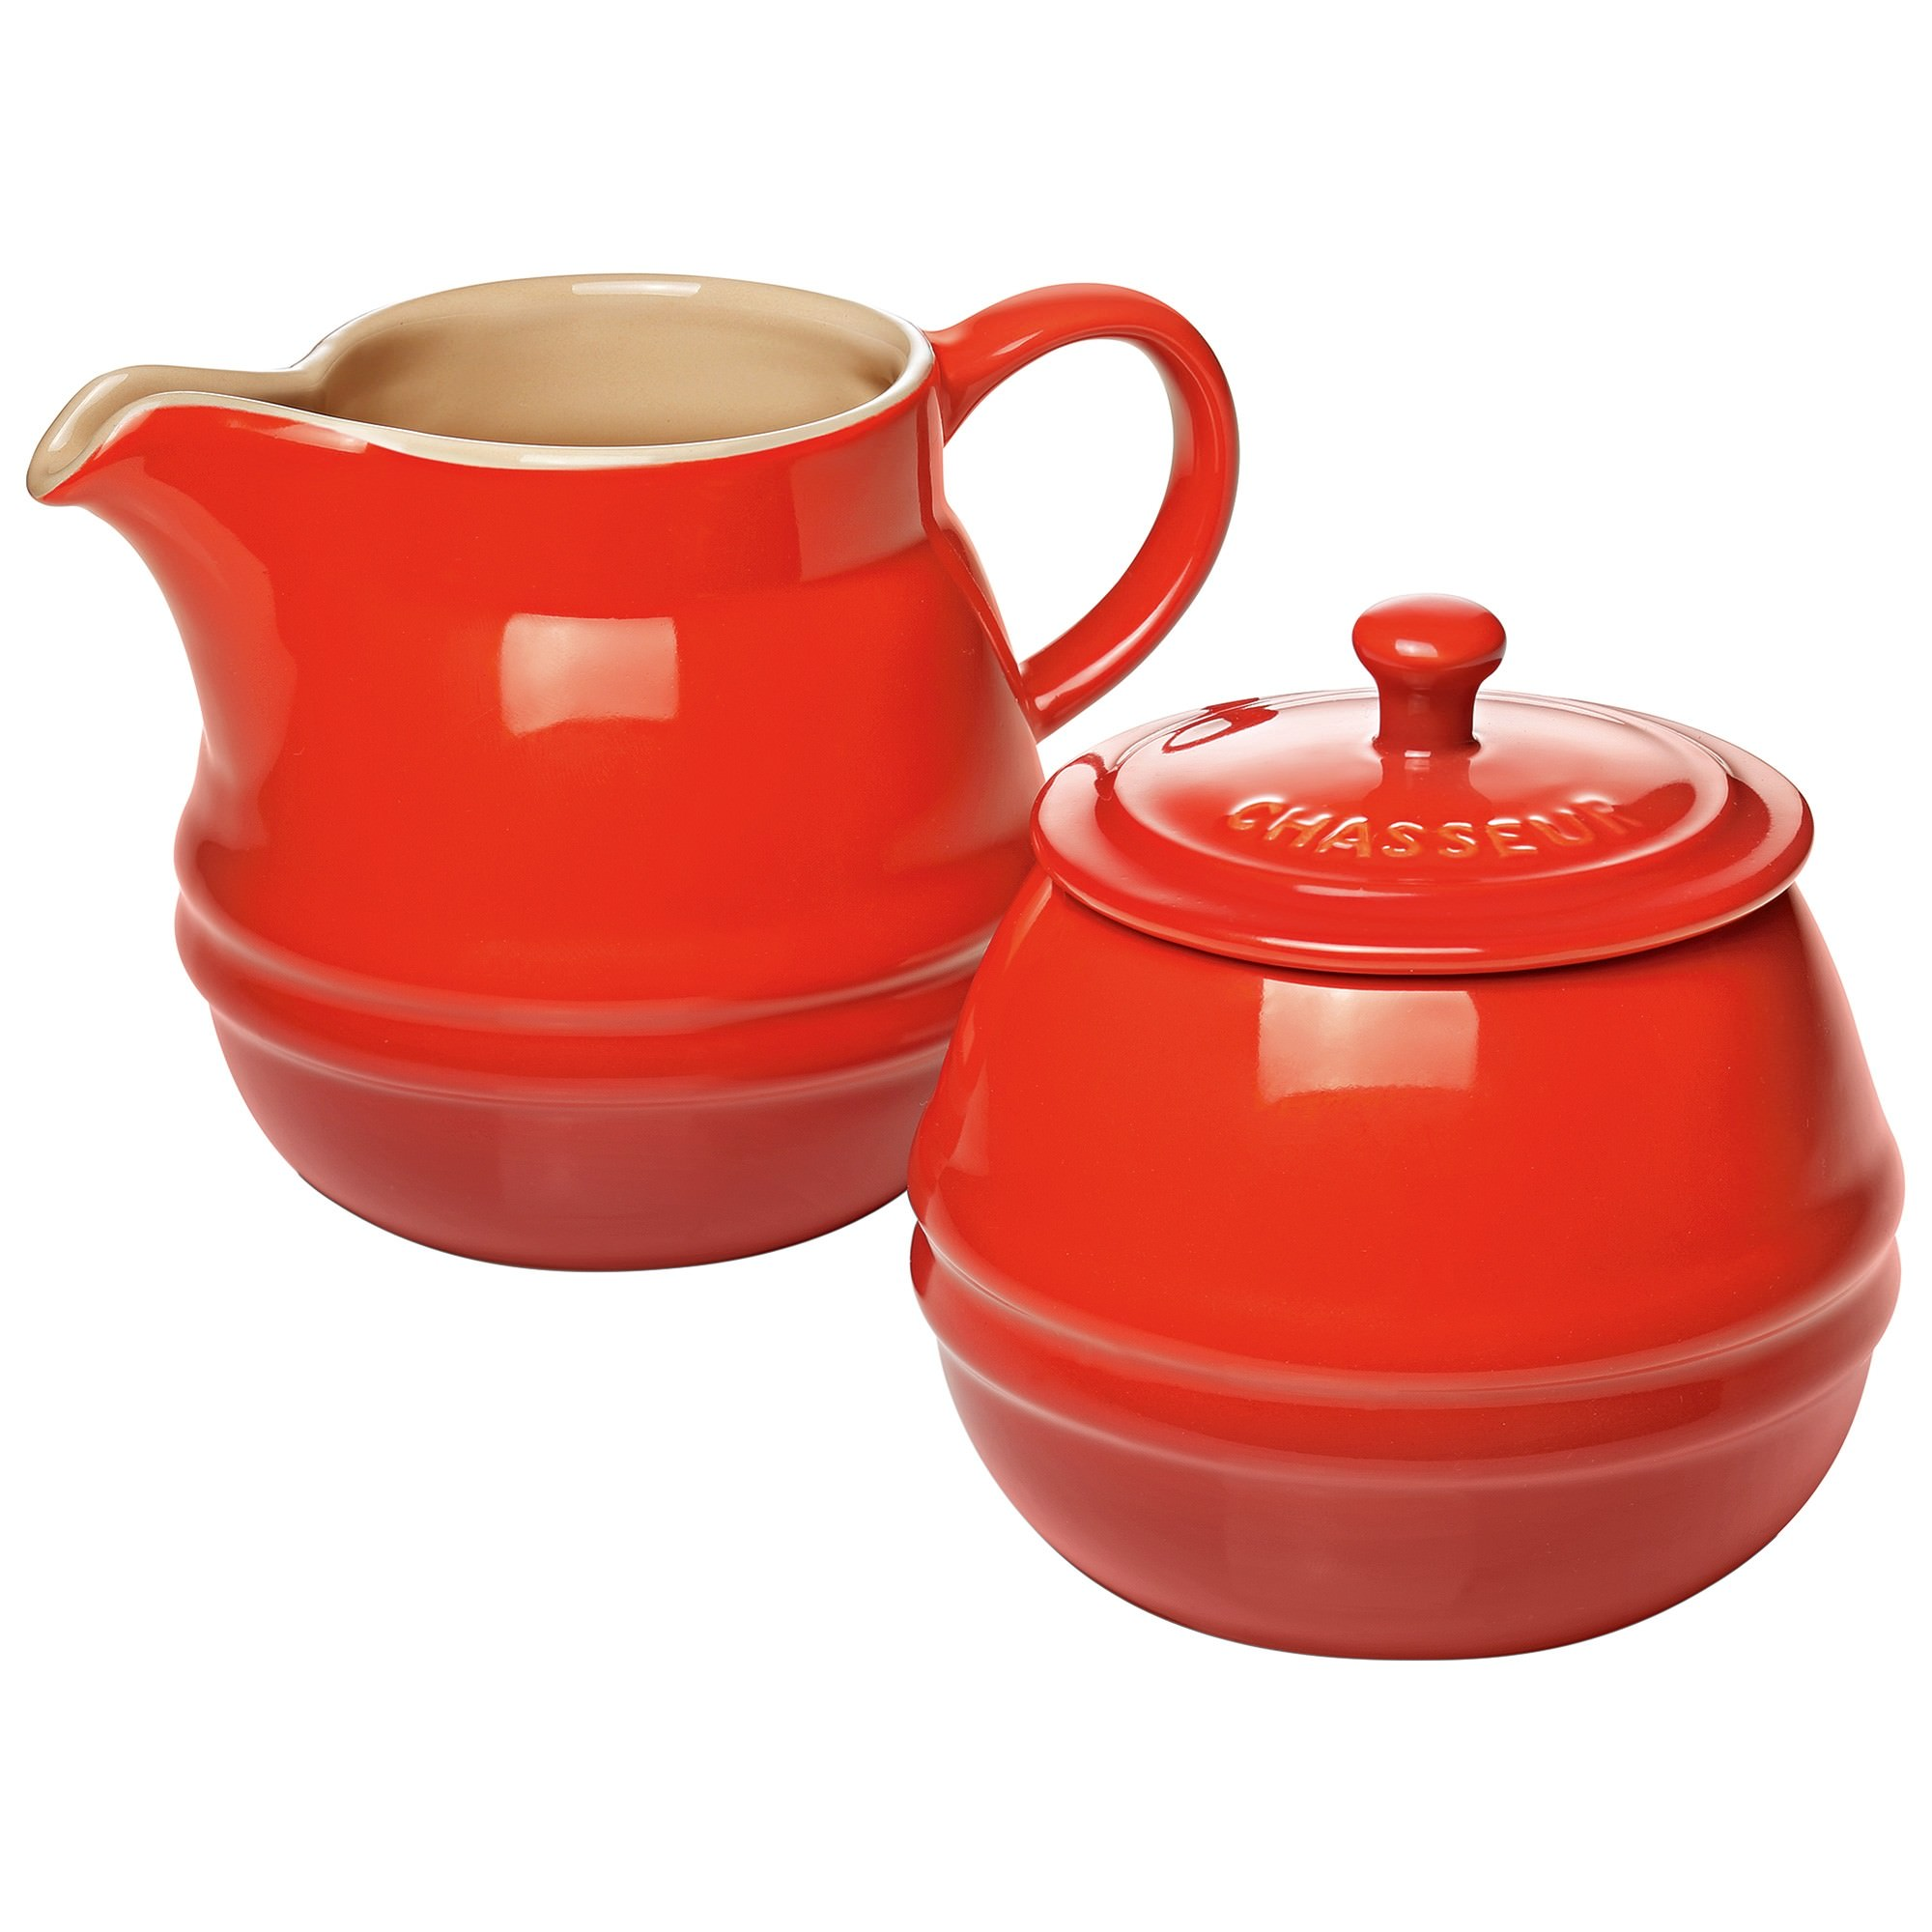 Chasseur La Cuisson Sugar Bowl and Creamer Set - Red